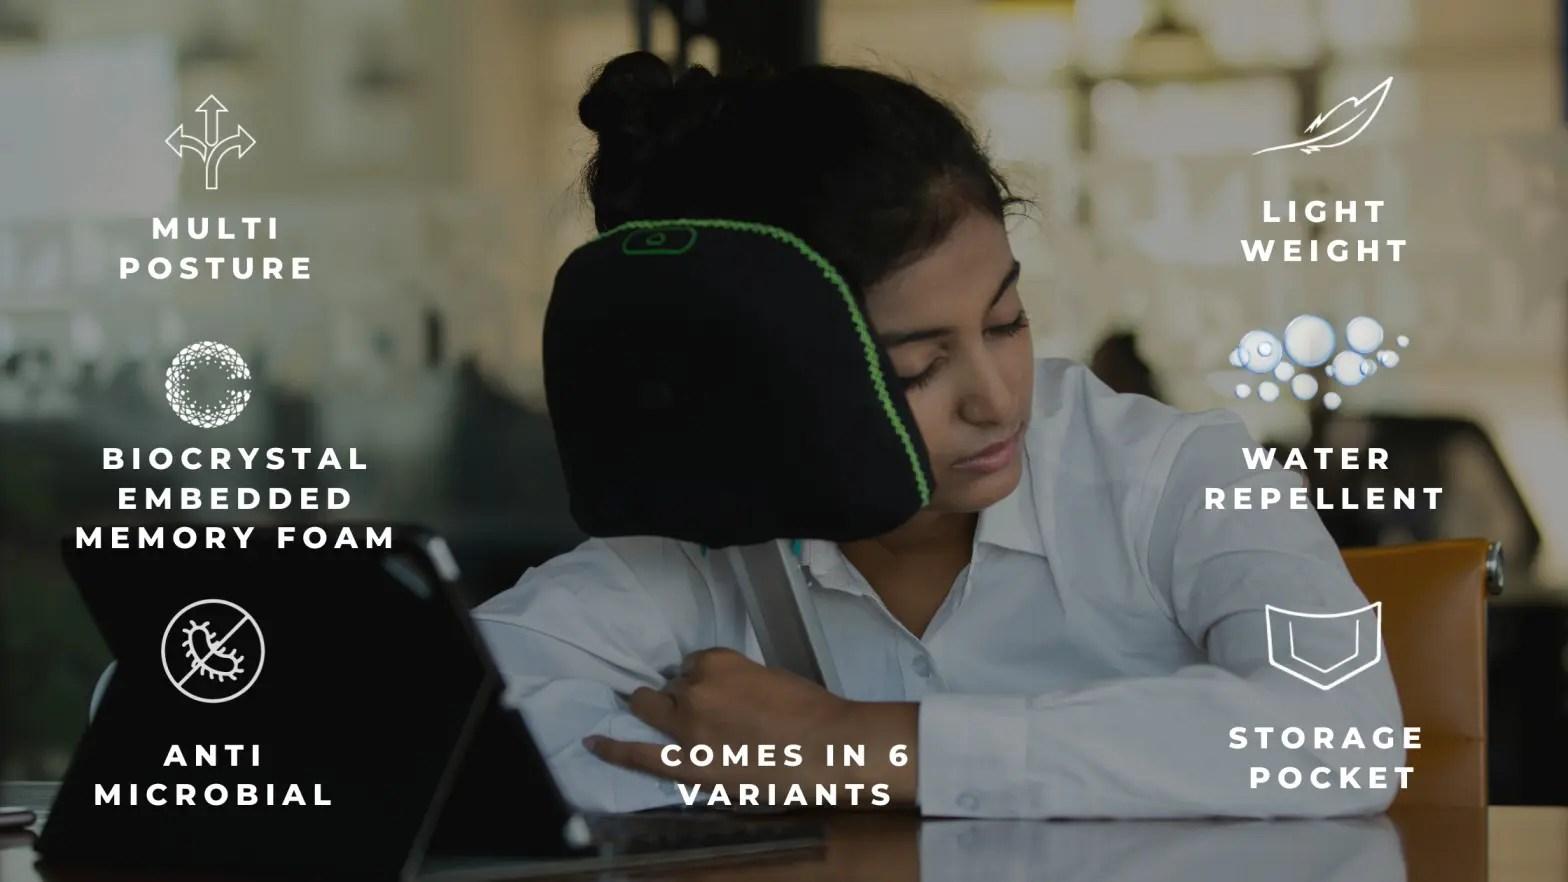 nap easy website image